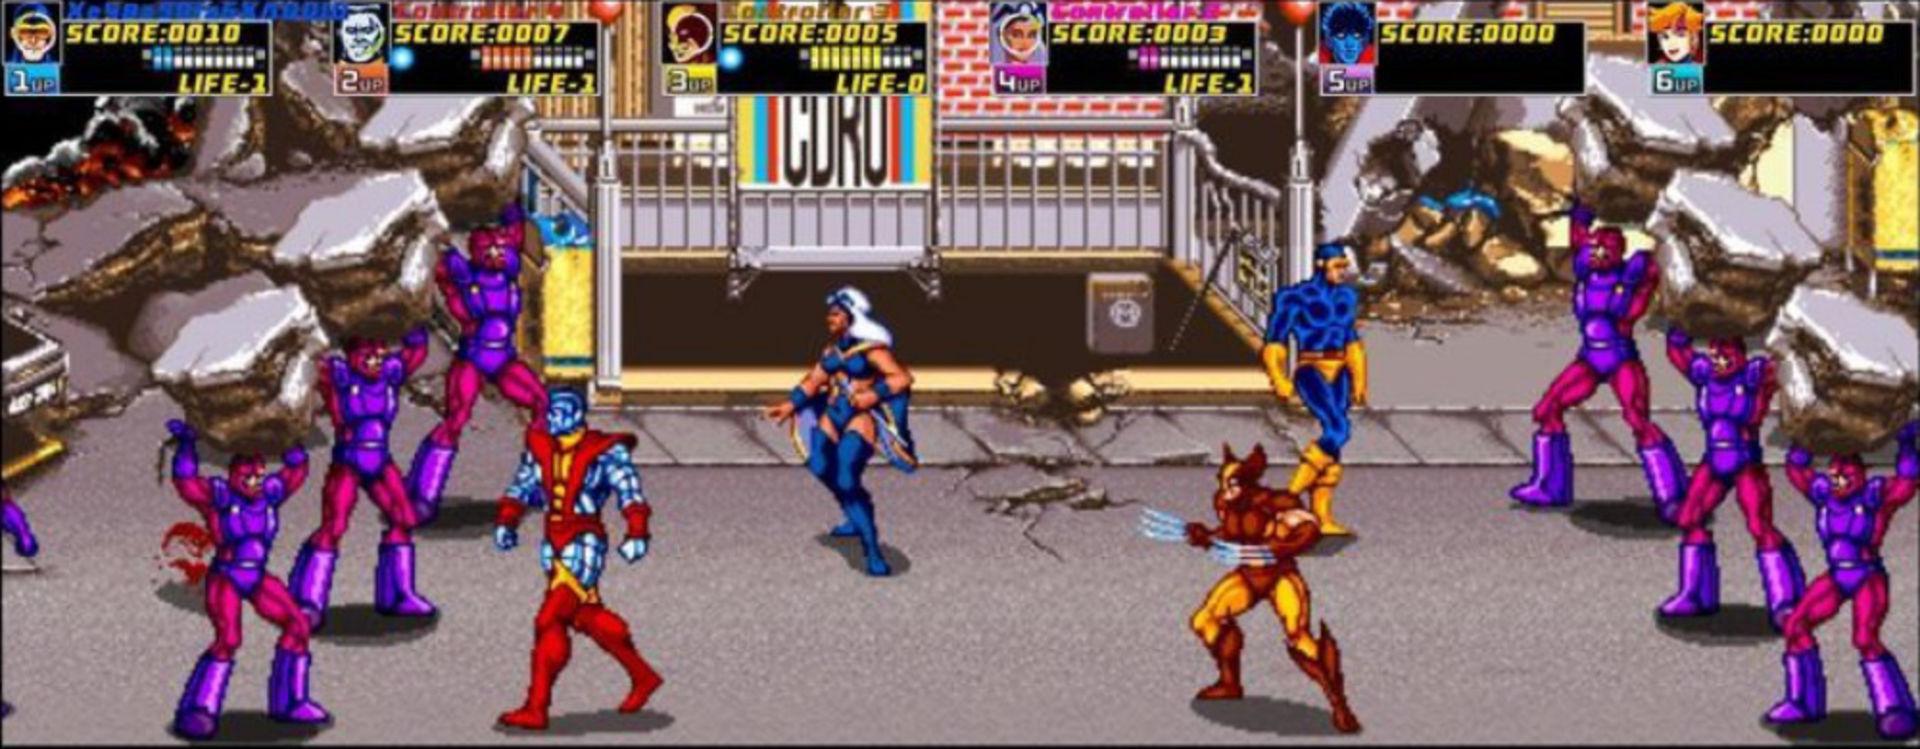 x-men-arcade-game-xbox-live-arcade-playstation-network-screenshot